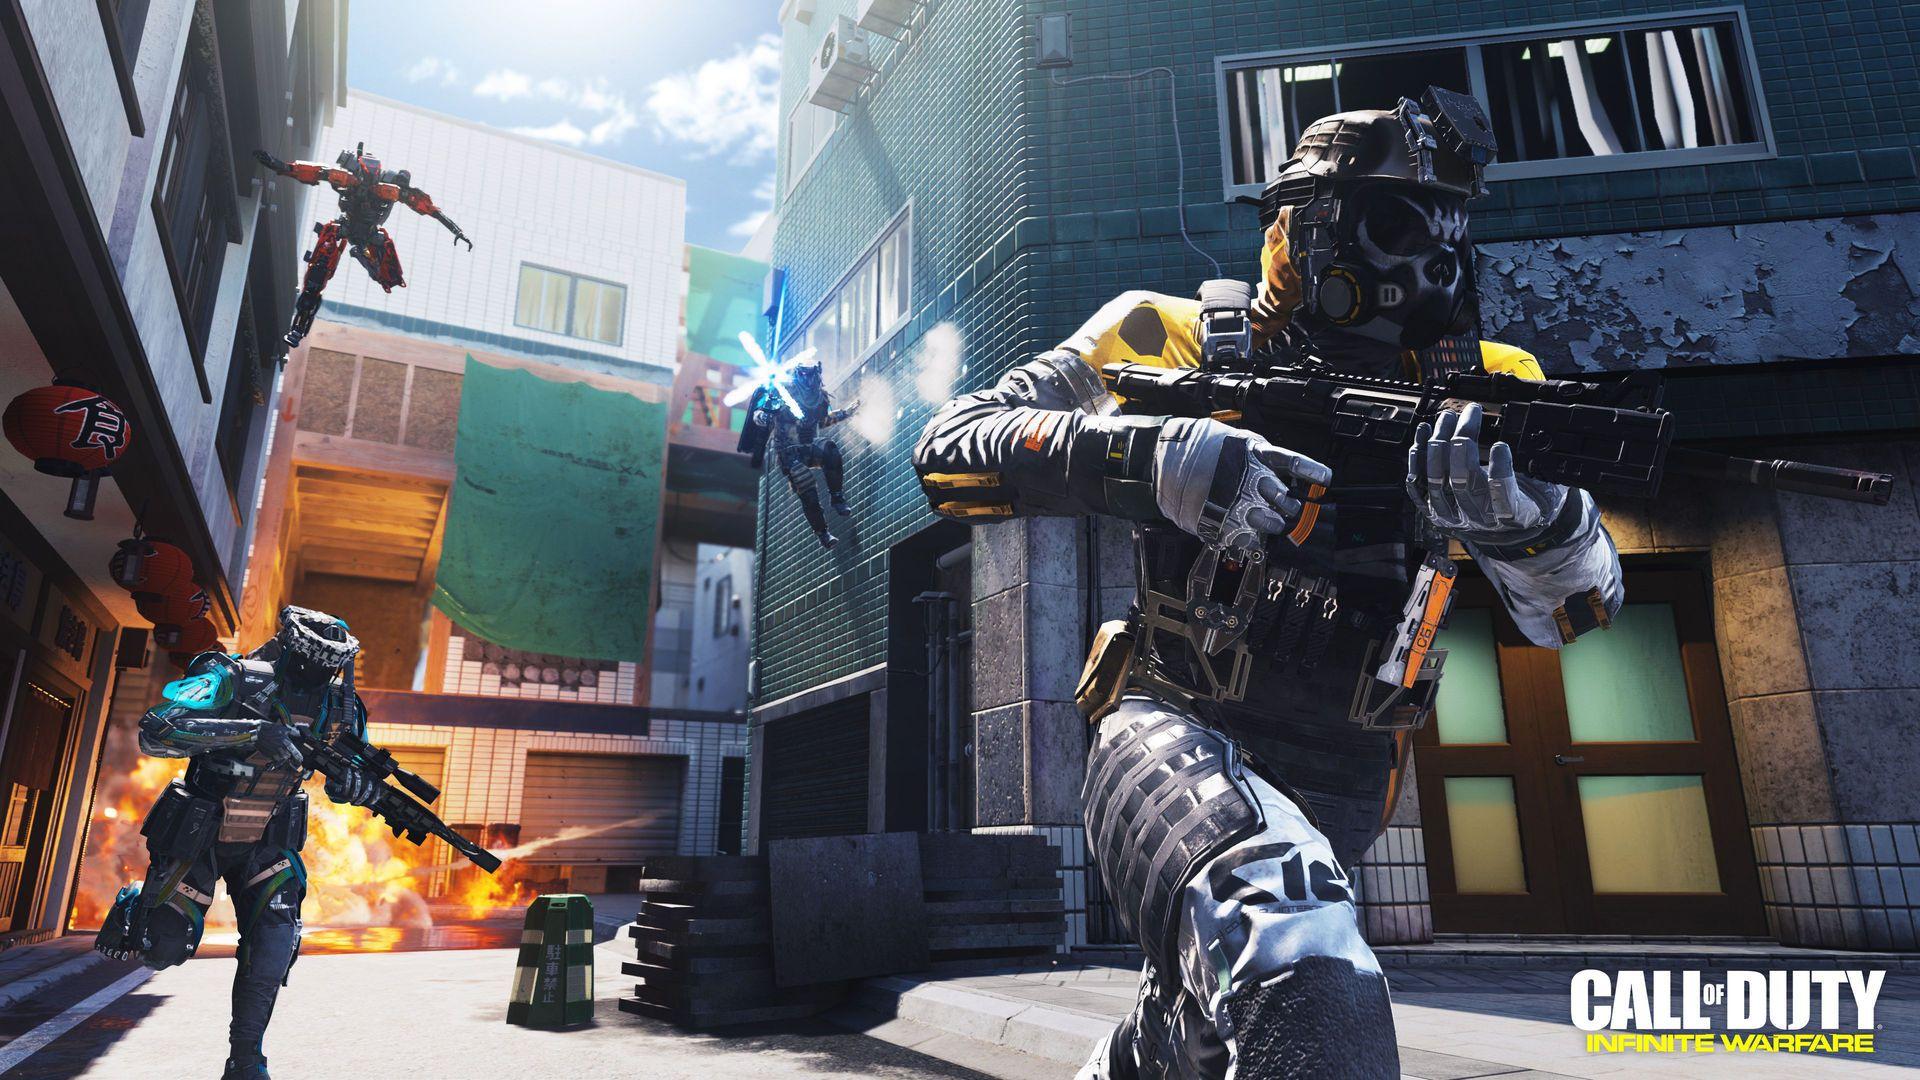 Wallpaper HD Call of Duty Infinite Warfare Shooter